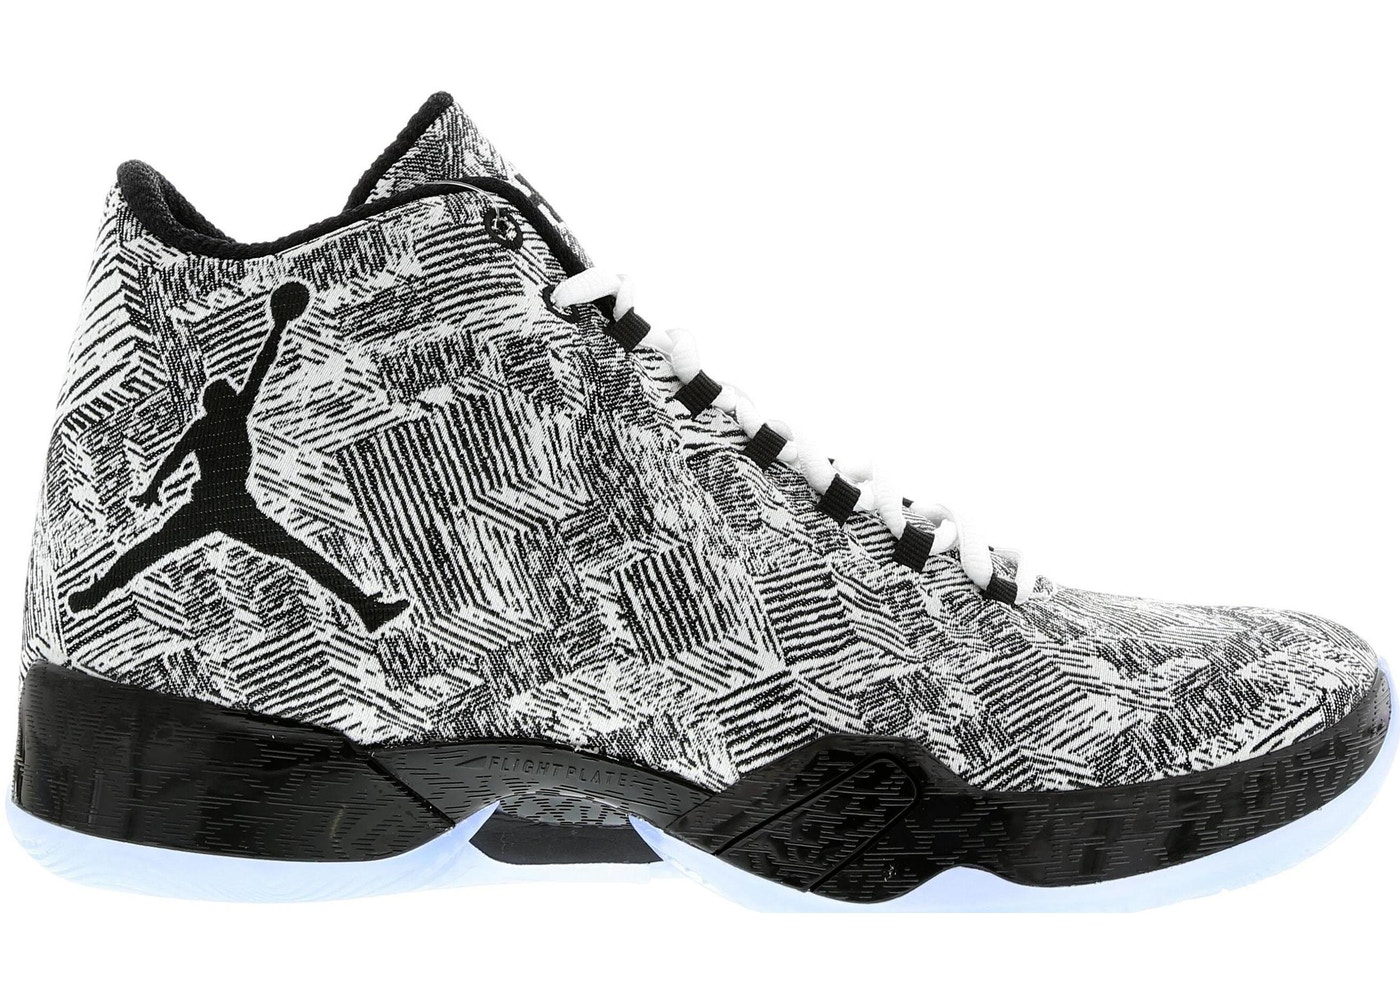 the best attitude 4e908 5cb9d Buy Air Jordan 29 Shoes & Deadstock Sneakers